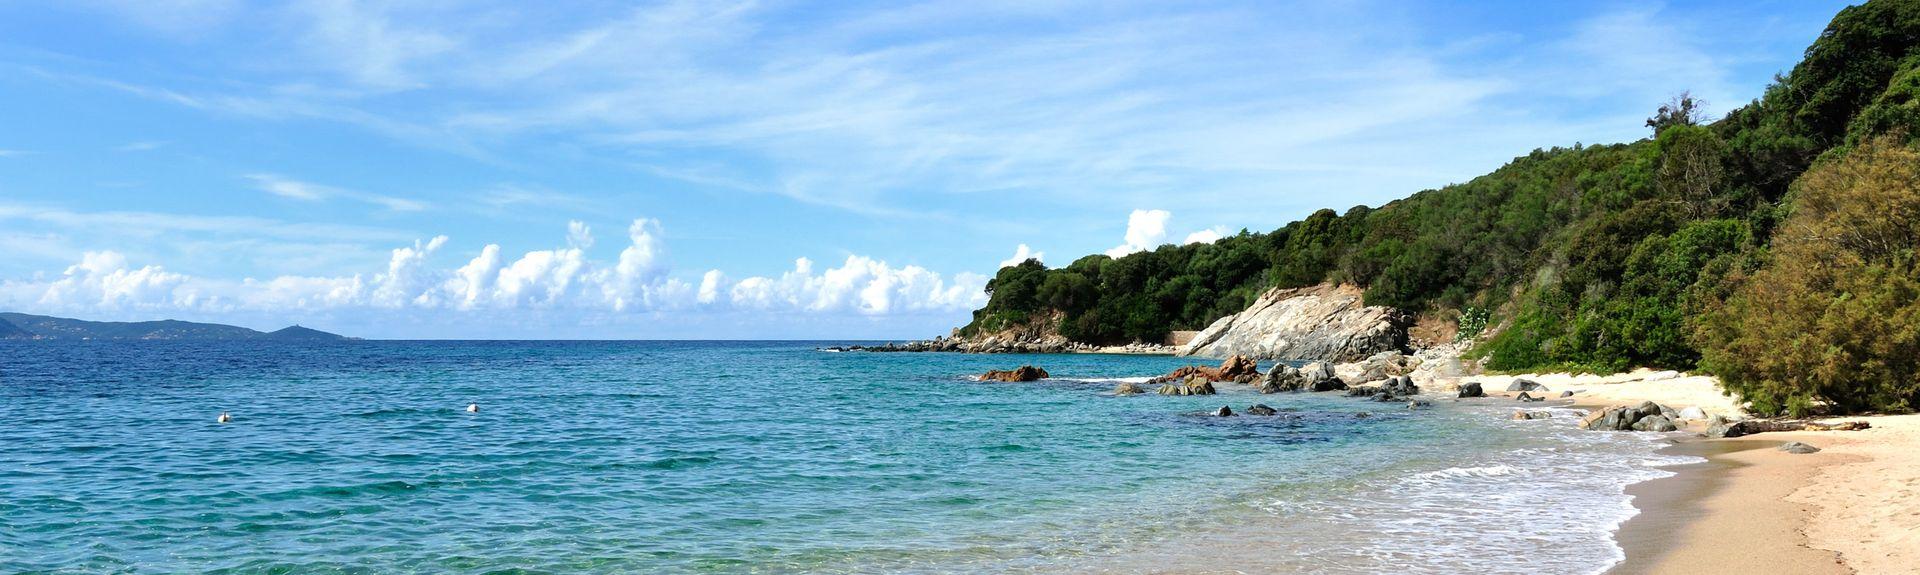 Propriano, Korsika, Frankreich